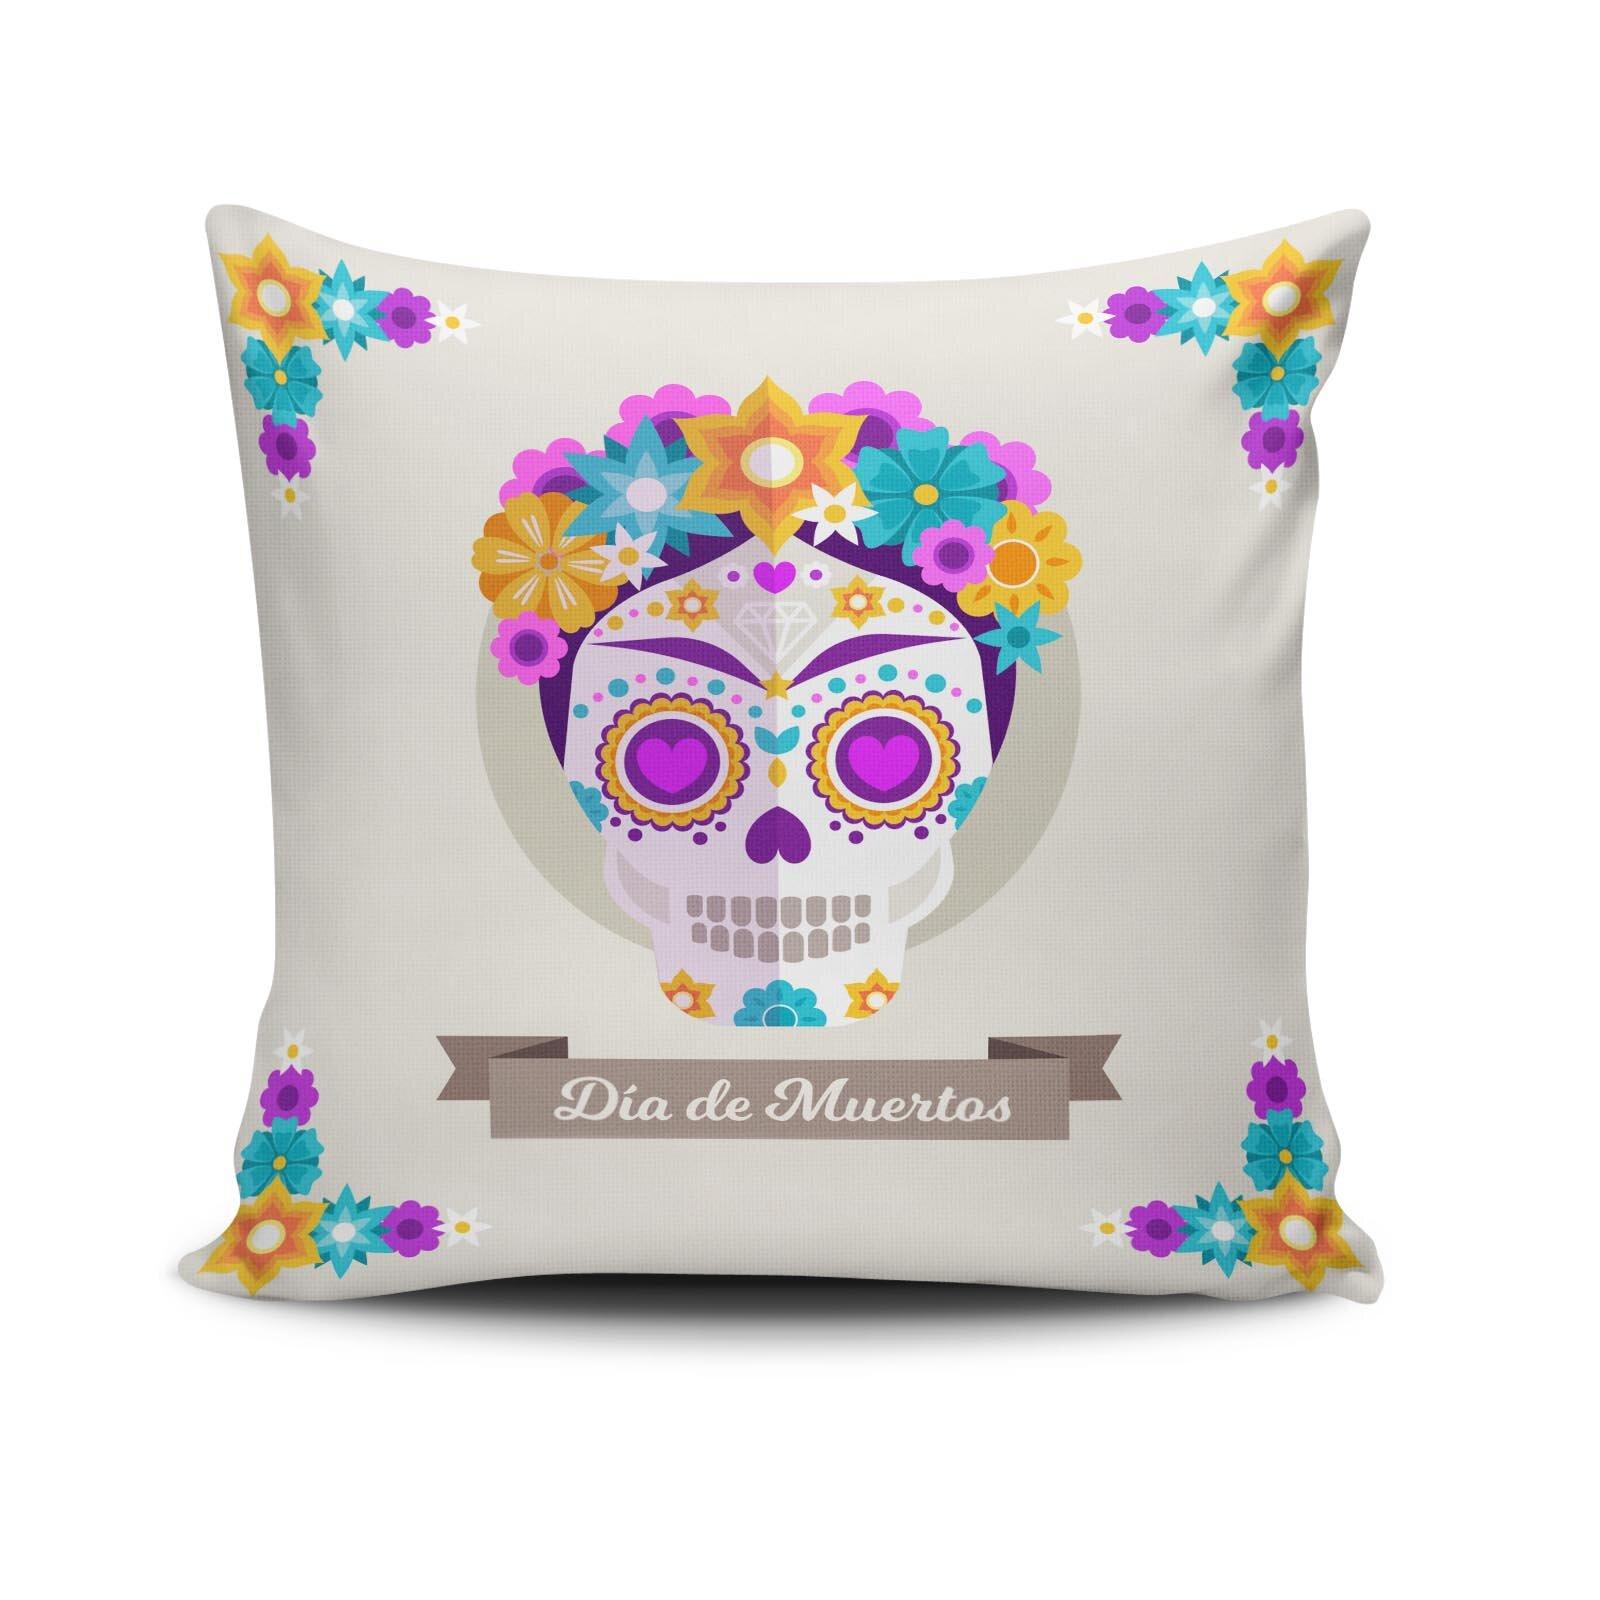 Perna decorativa Cushion Love, Dimensiune: 45 x 45 cm, Material exterior: 50% bumbac / 50% poliester 768CLV0264